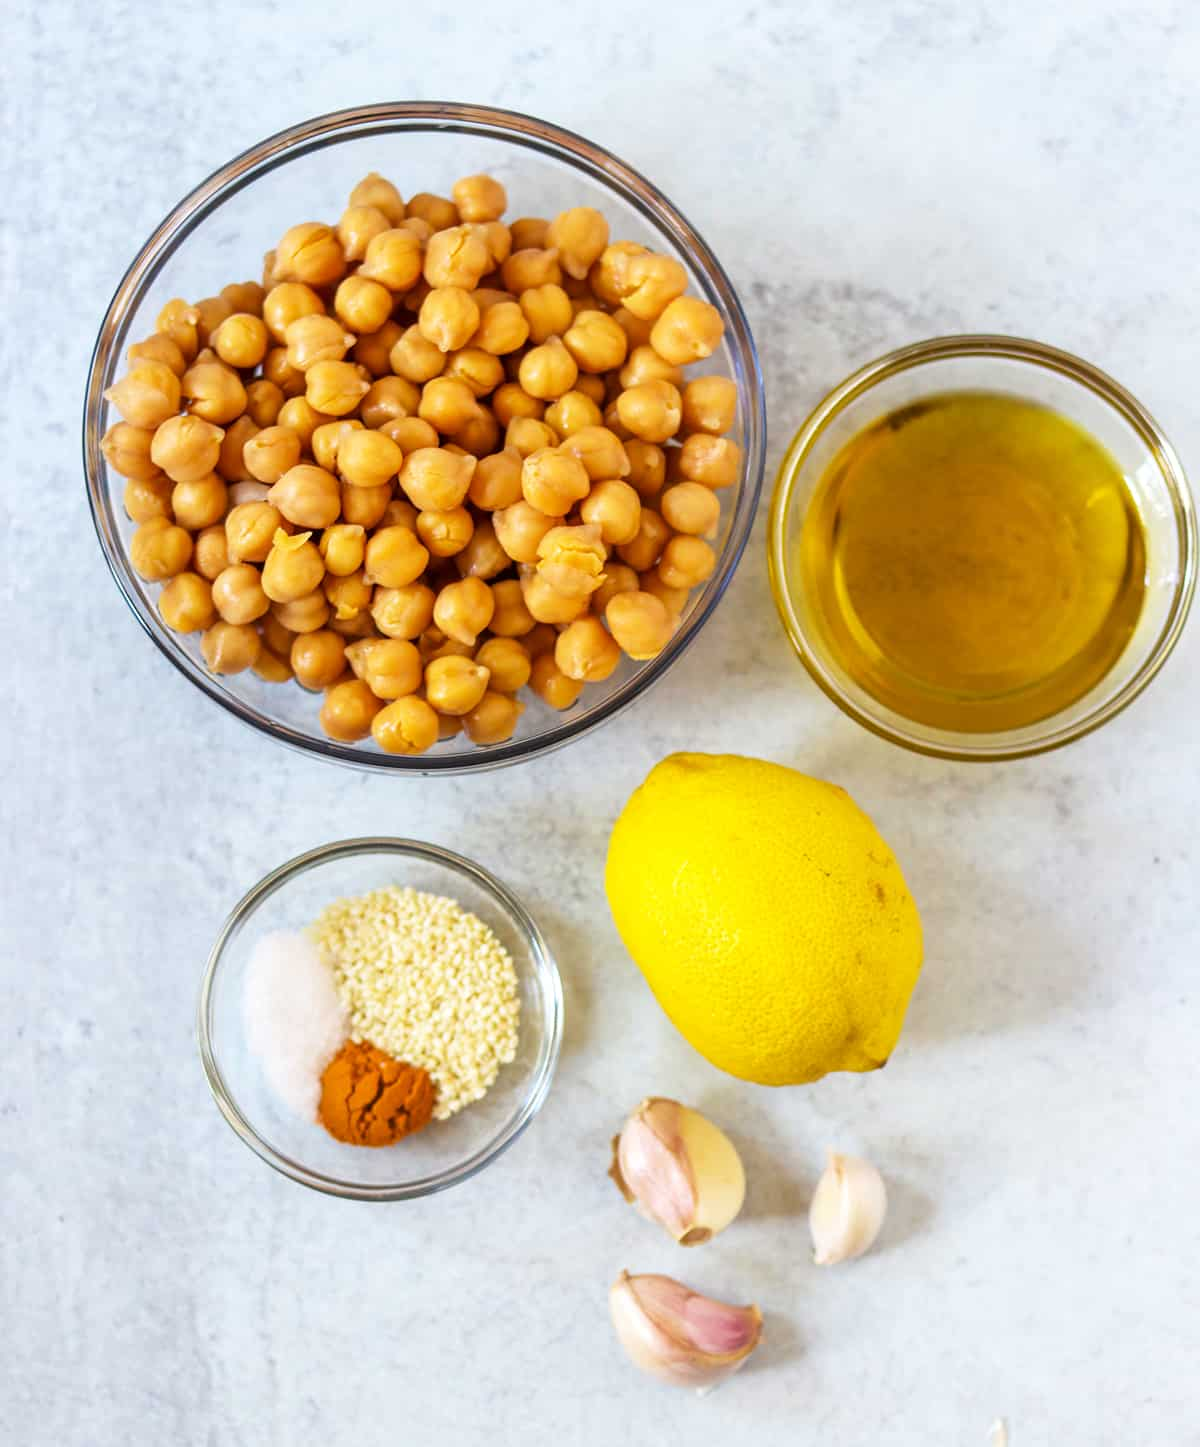 ingredients in this turmeric hummus. chickpeas, olive oil, lemon, sesame seeds, turmeric, salt, garlic cloves